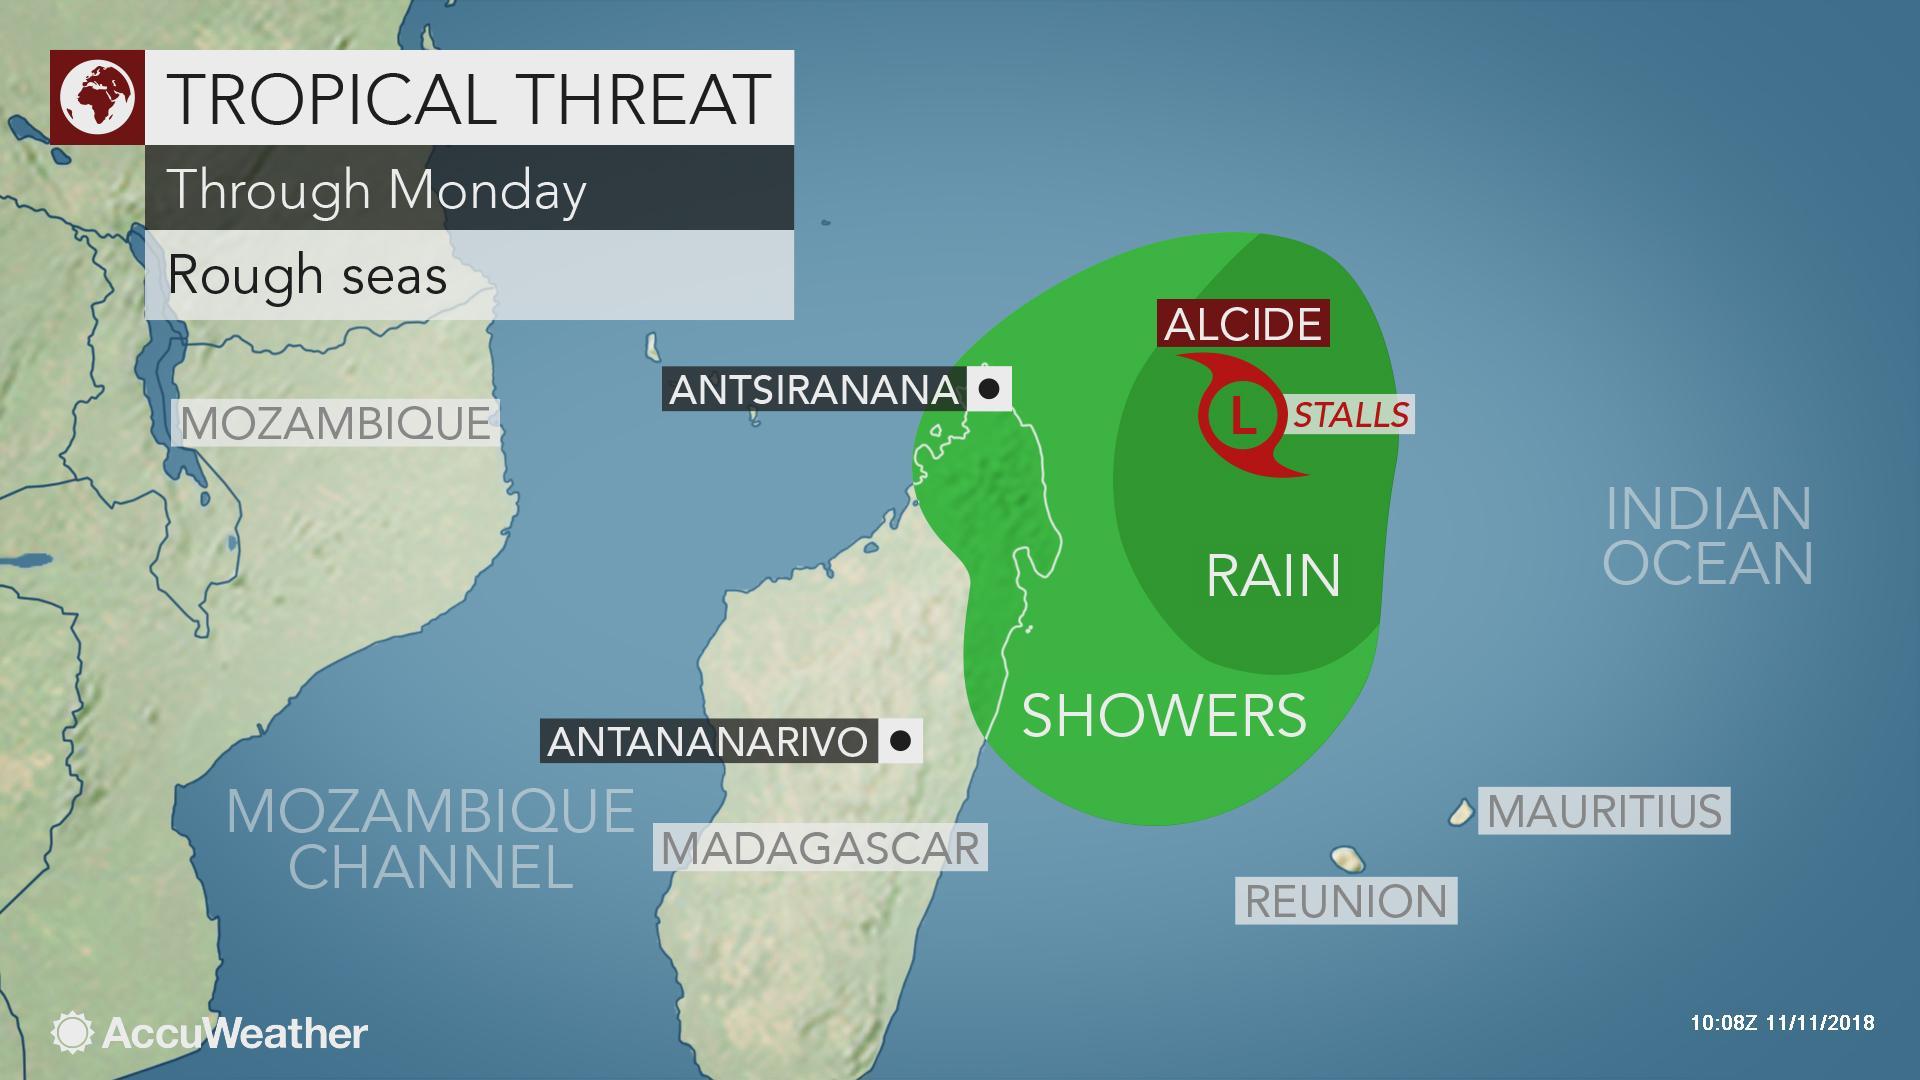 Alcide to stir rough surf along Madagascar coast into early week